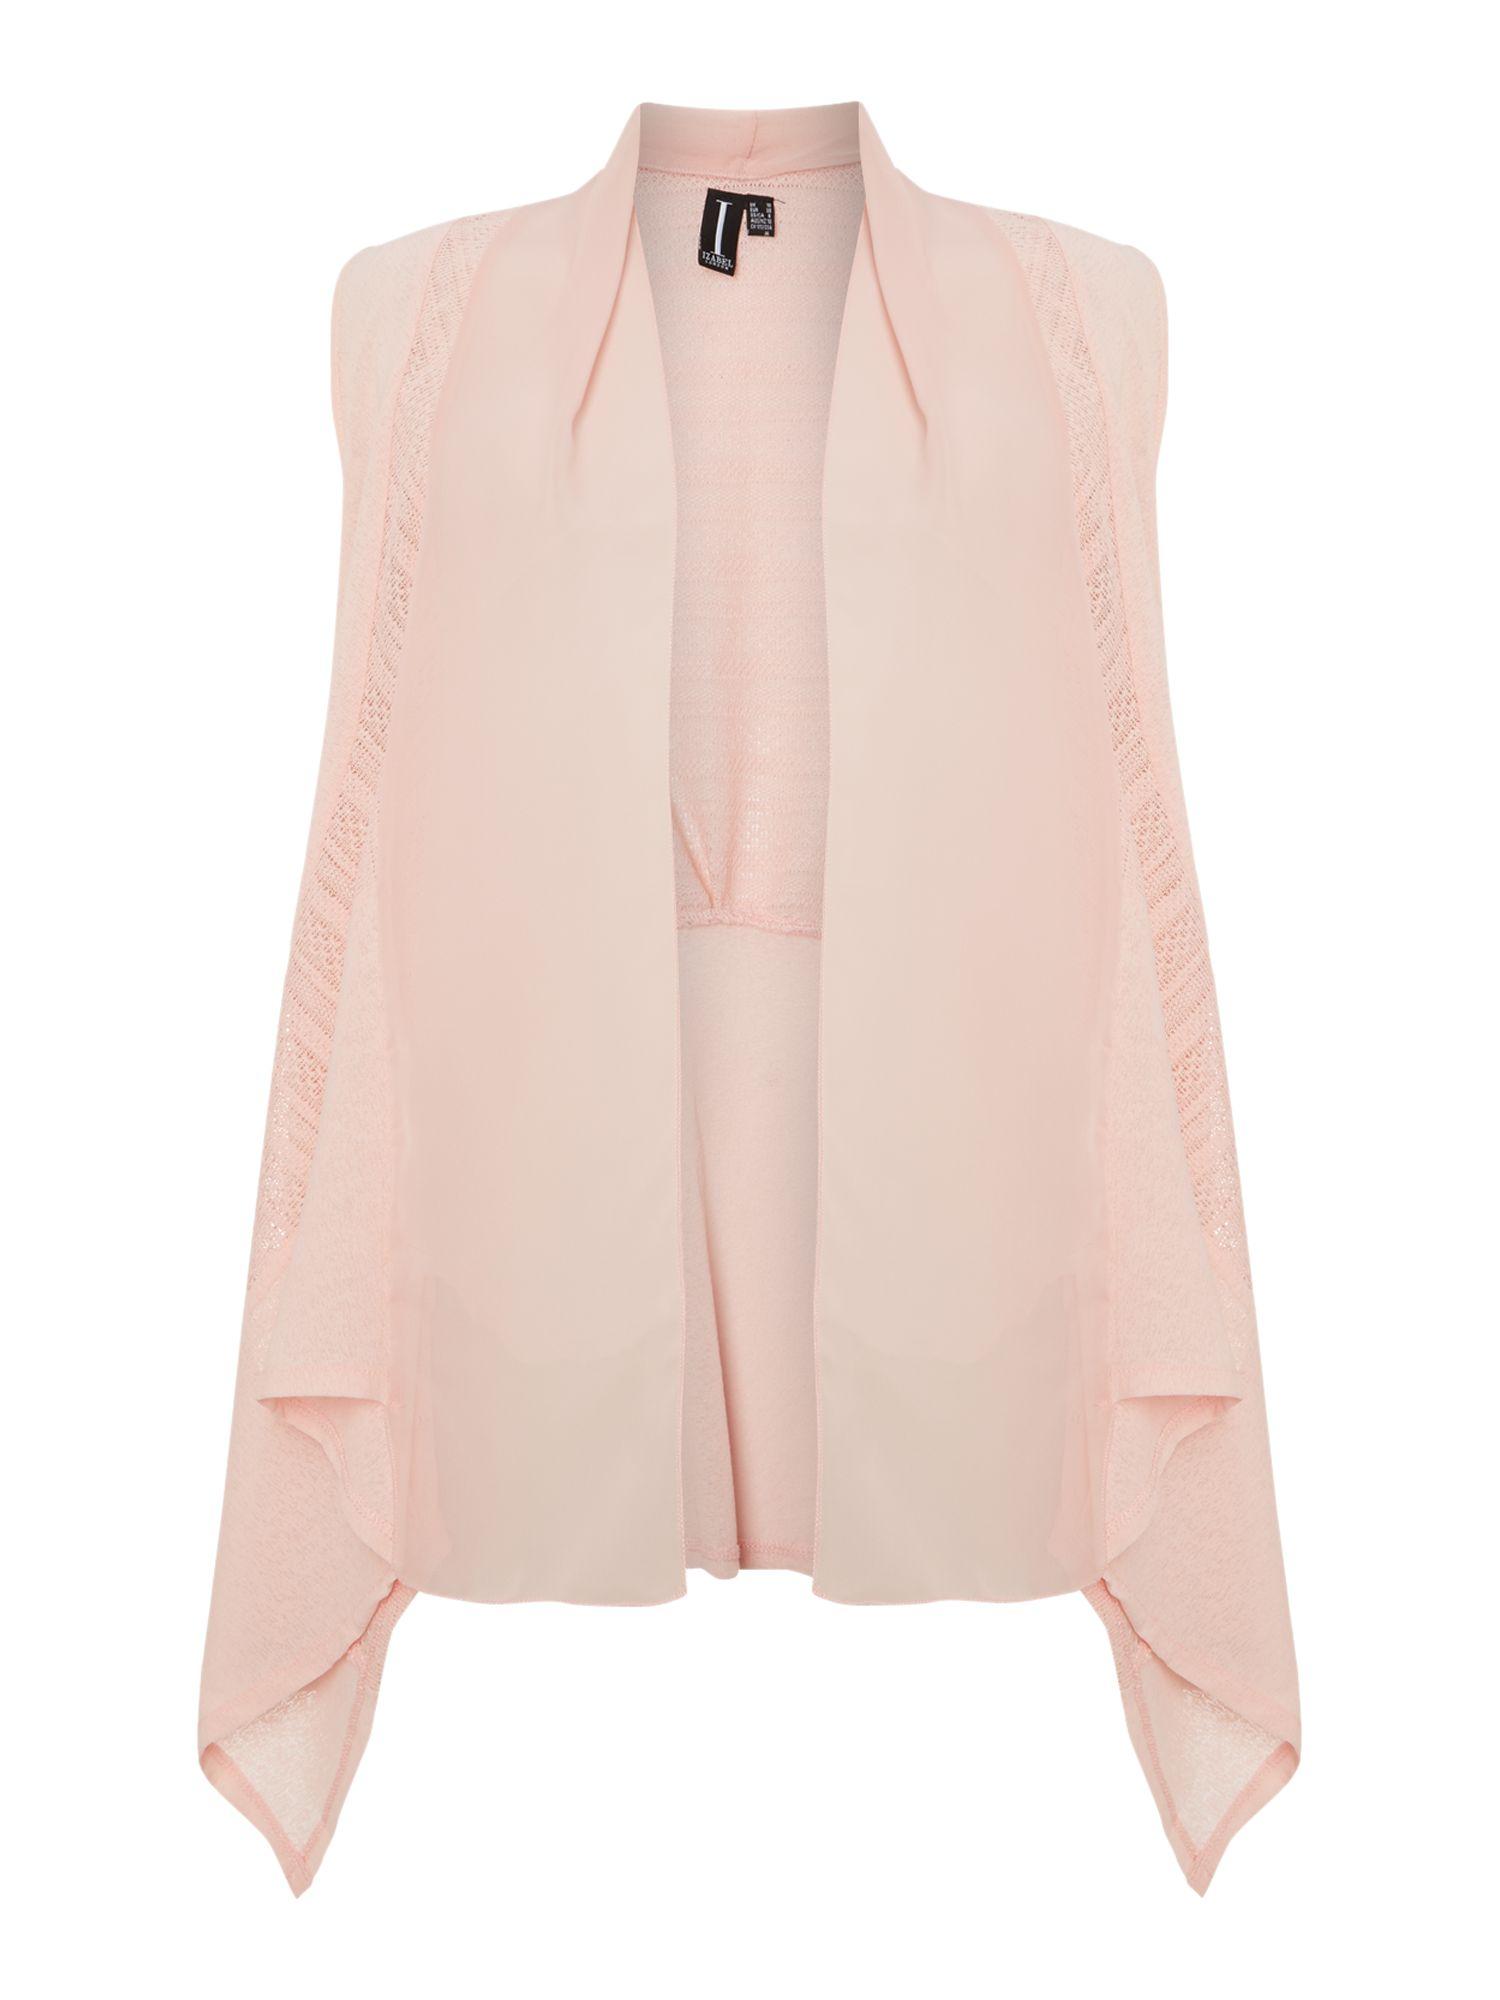 Izabel london Chiffon Style Waterfall Cardigan in Pink | Lyst